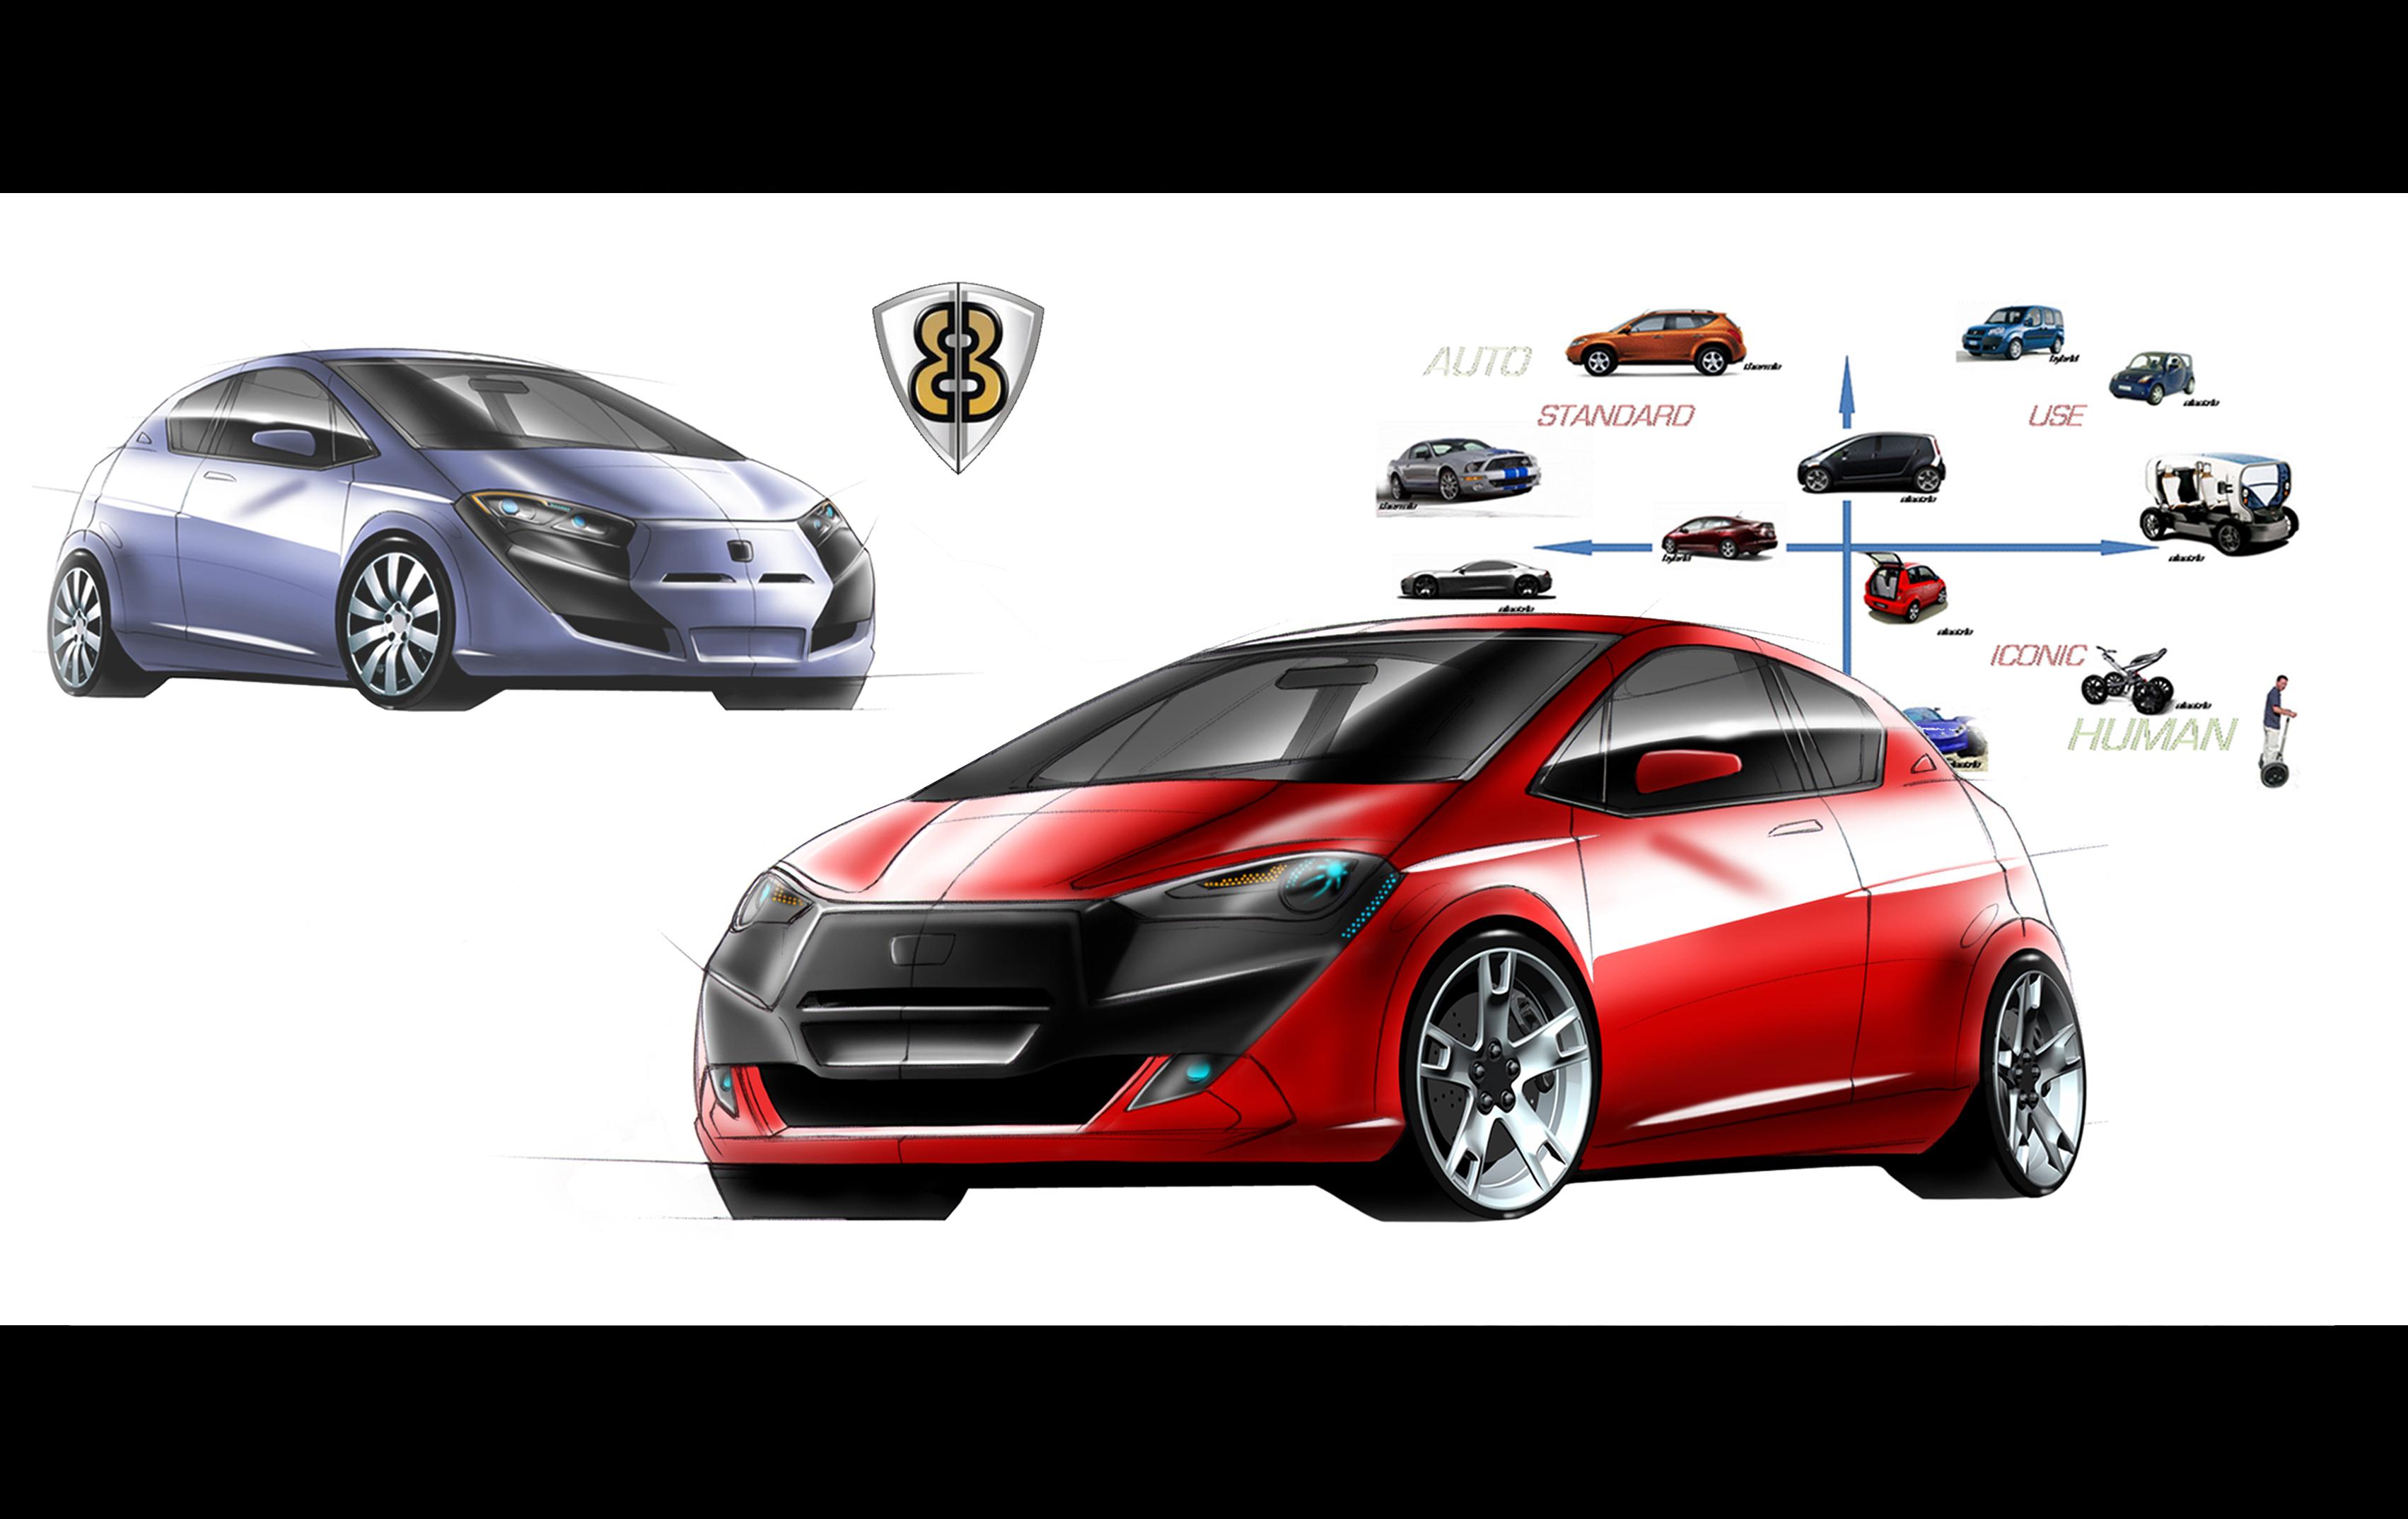 BAVINA Cars - Inde